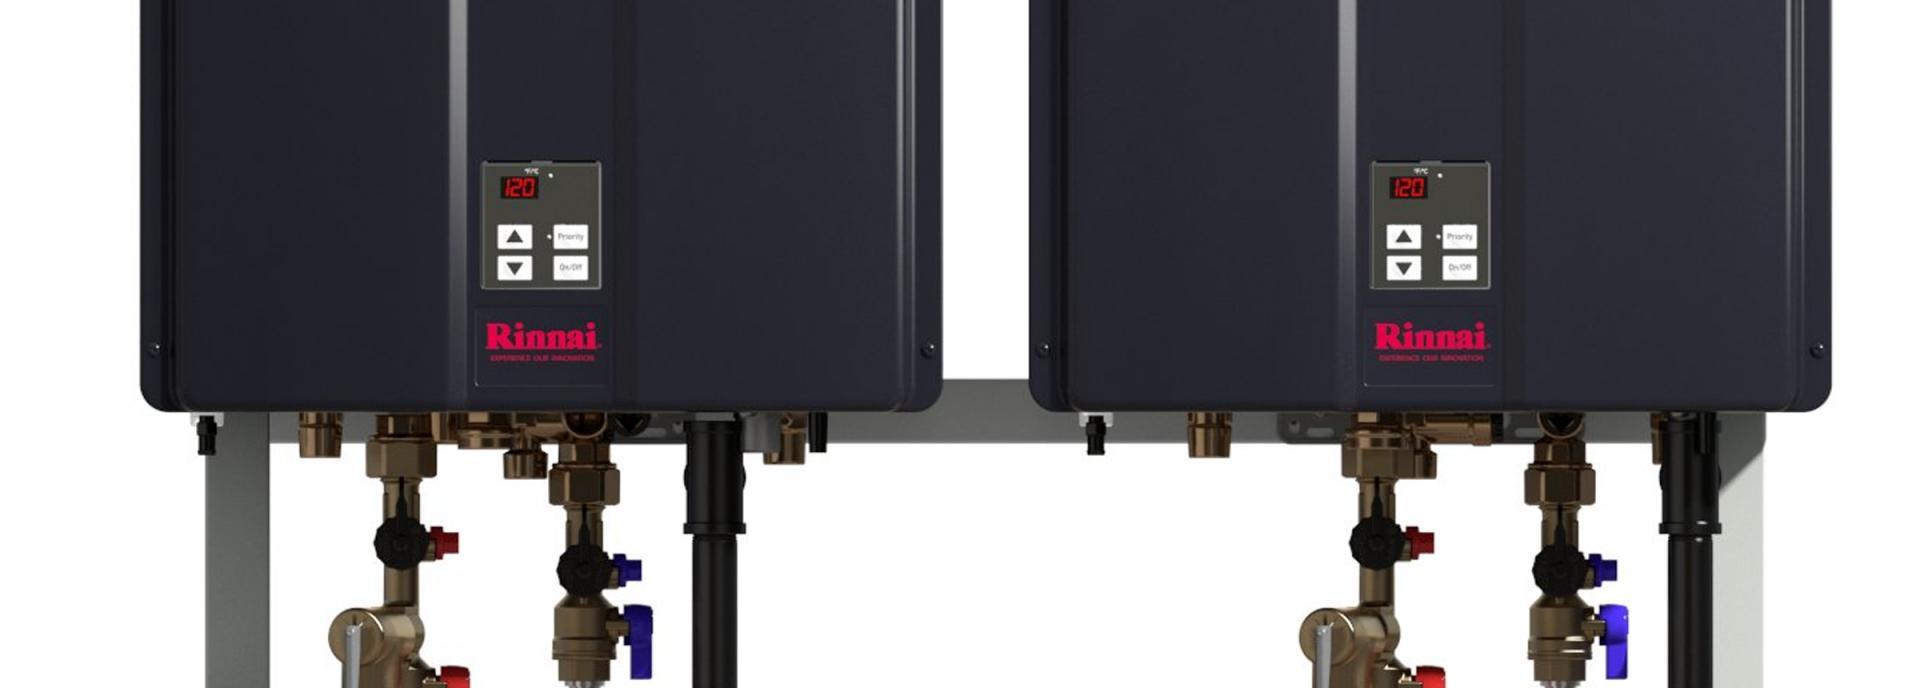 cu199 models rinnai america rh rinnai us Hot Water Boiler Wiring Taco Zone Valve Wiring Diagram